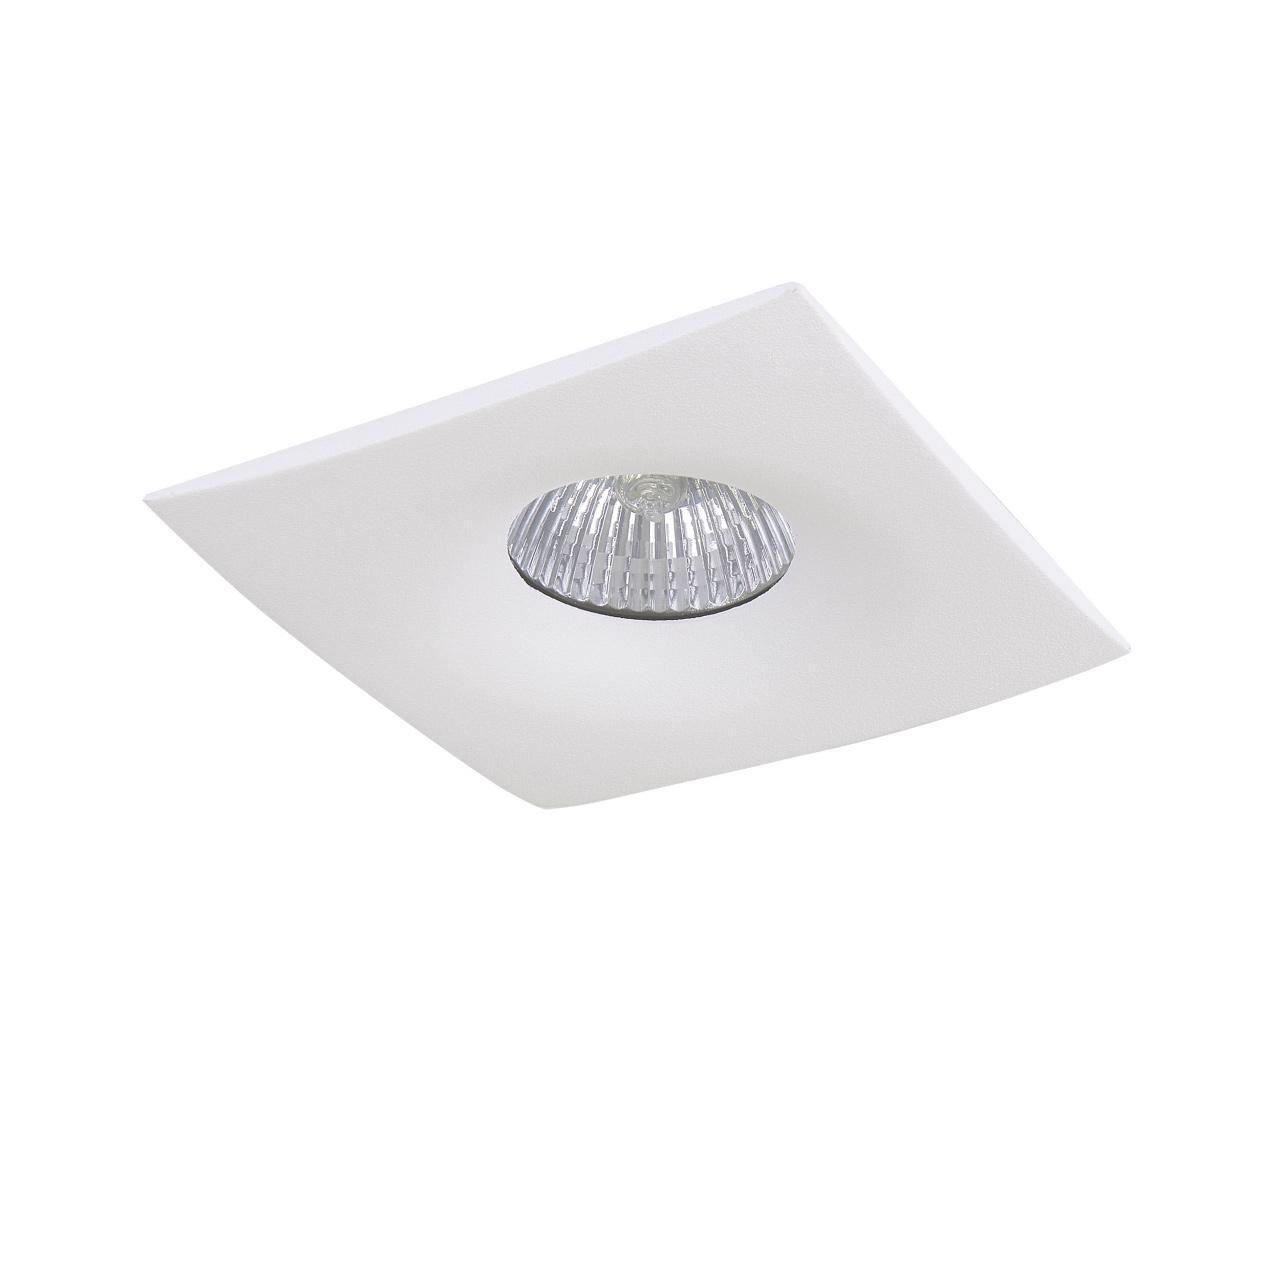 Светильник Levigo Q MR16 / HP16 белый Lightstar 010030